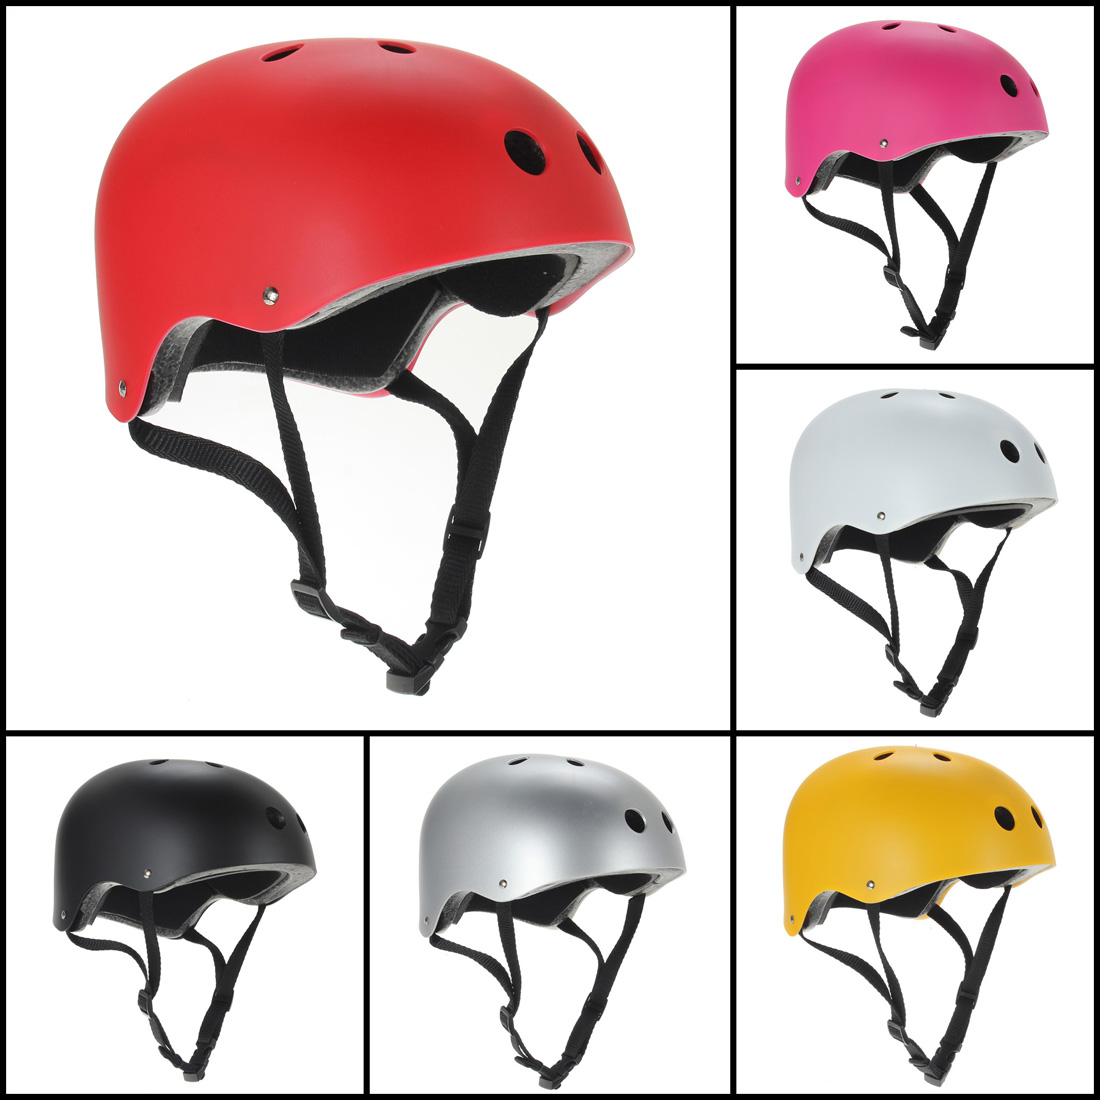 BMX Bike Scooter Roller Derby Inline Ski Skate Board Helmet Matte Size M Black